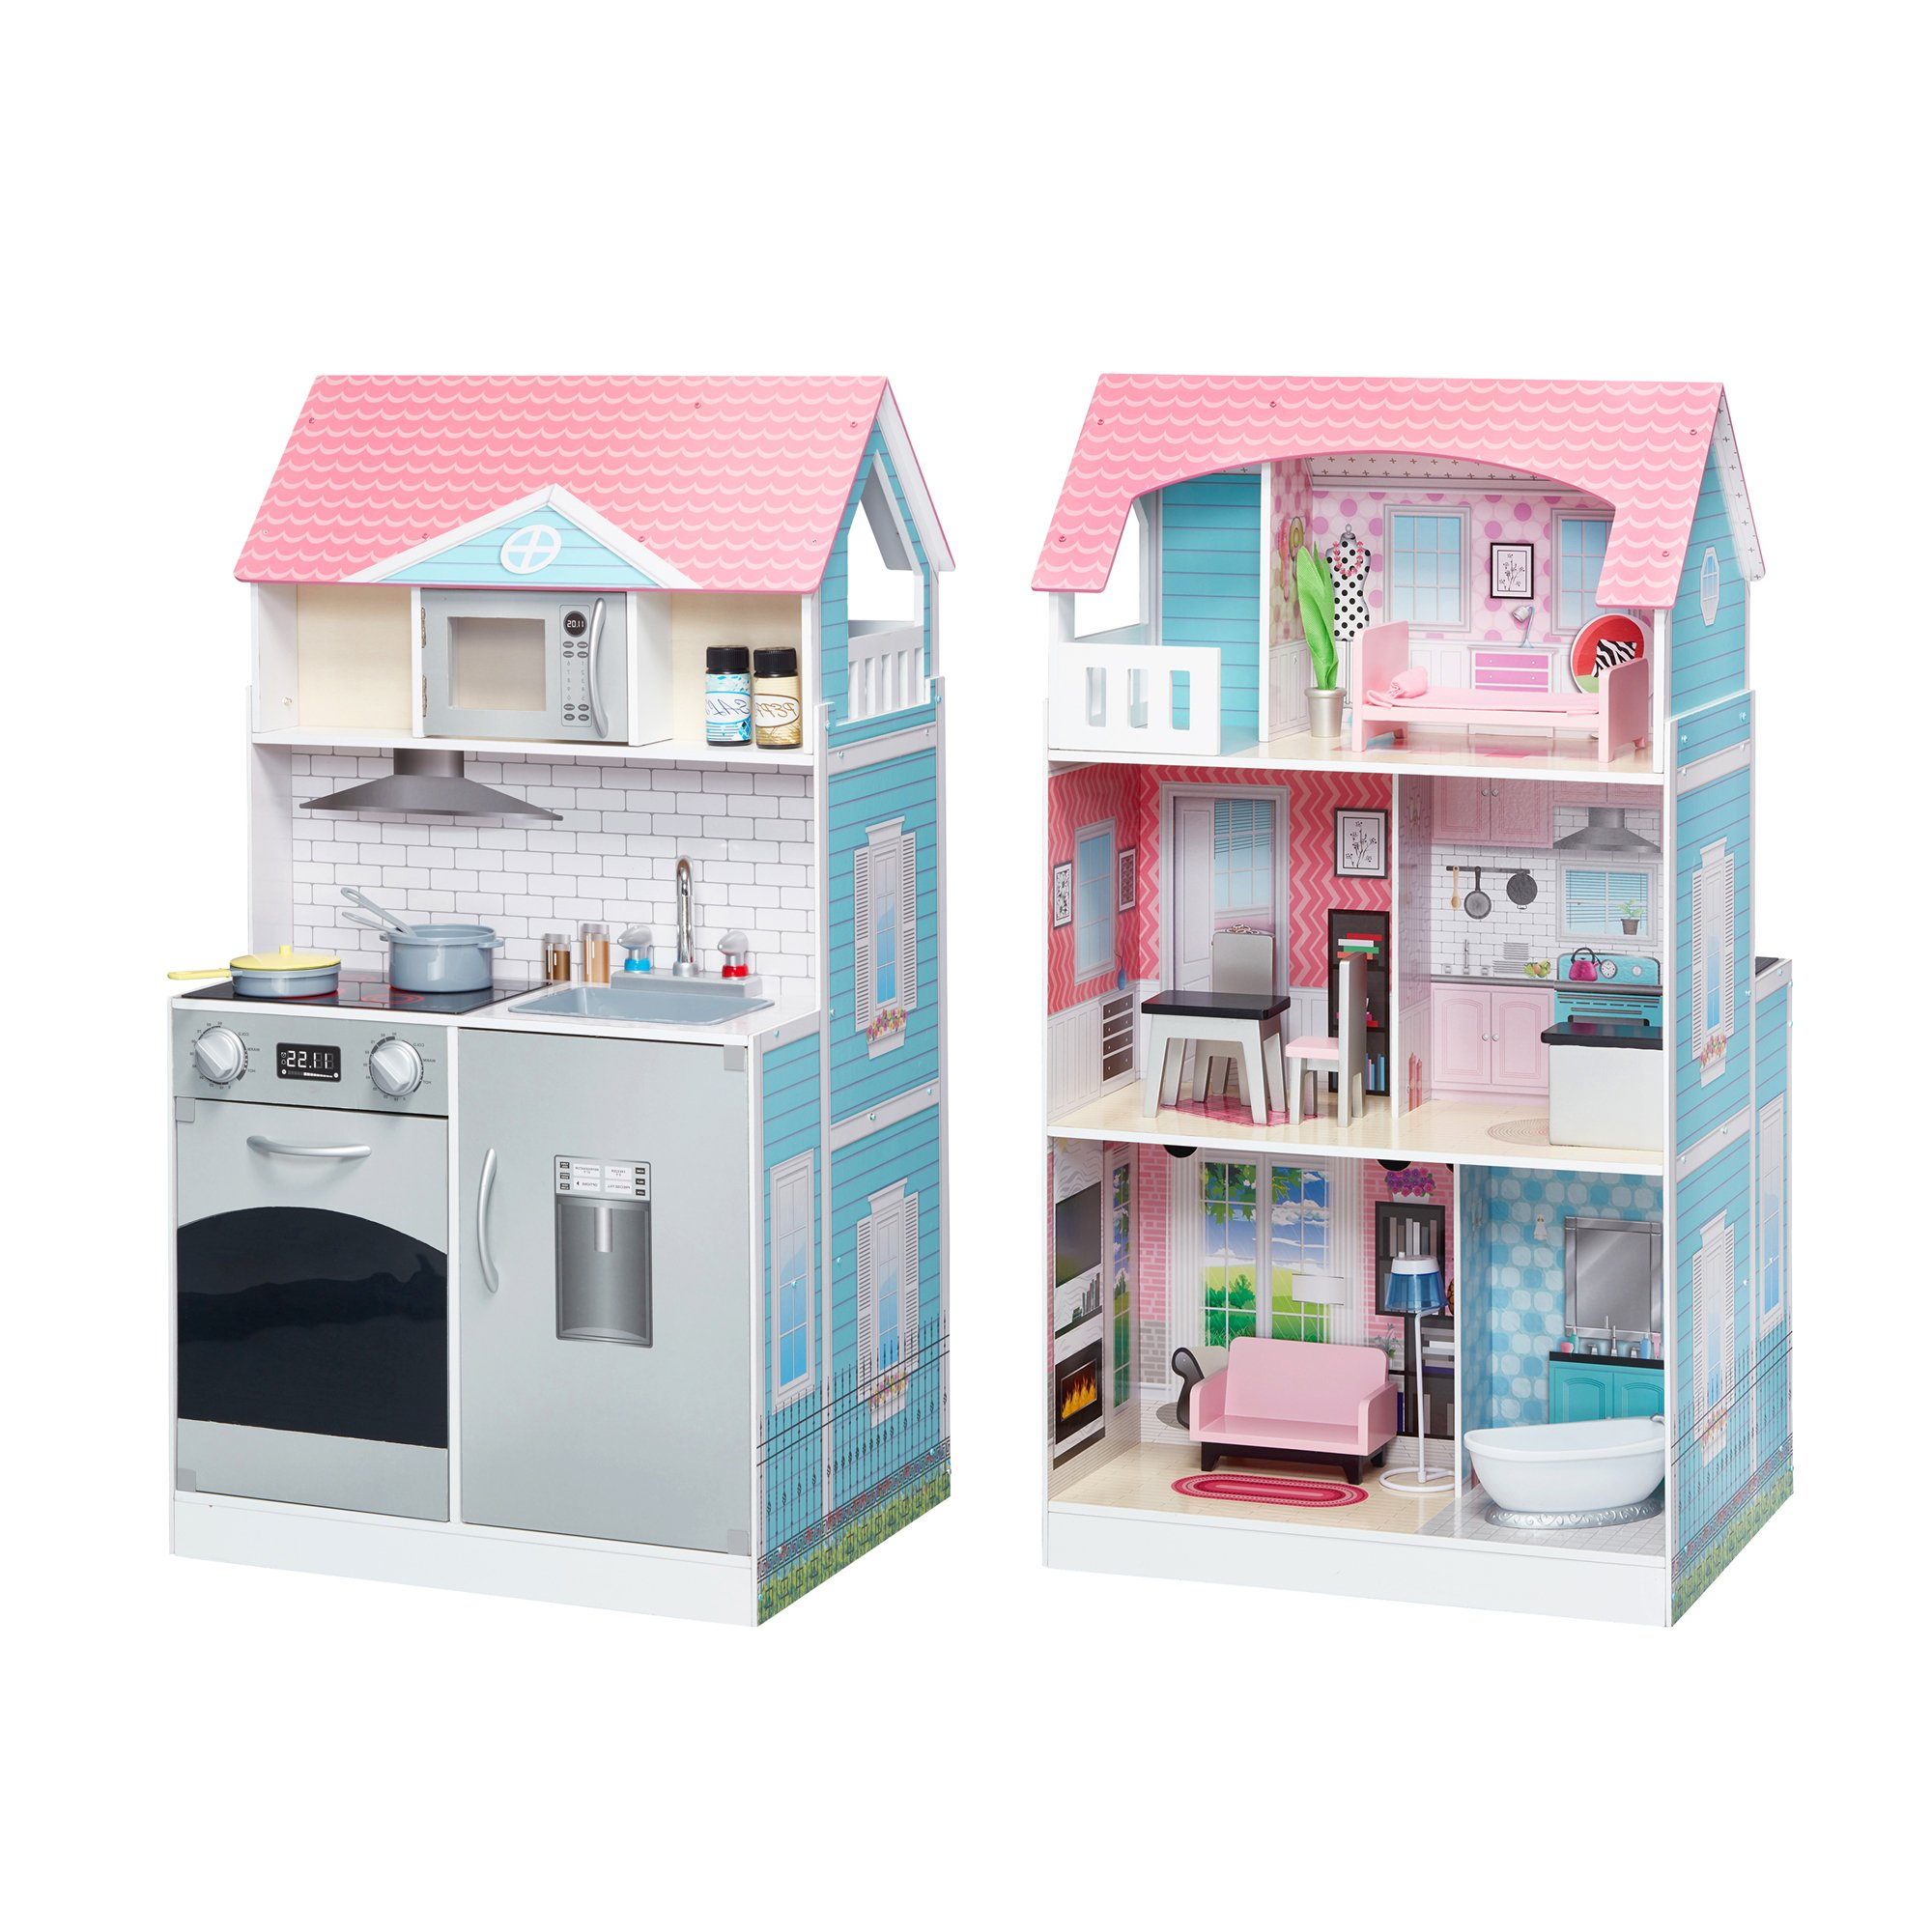 Teamson Kids - Wonderland Ariel 2 in 1 Doll House & Play Kitchen - Muti-color by Teamson Kids